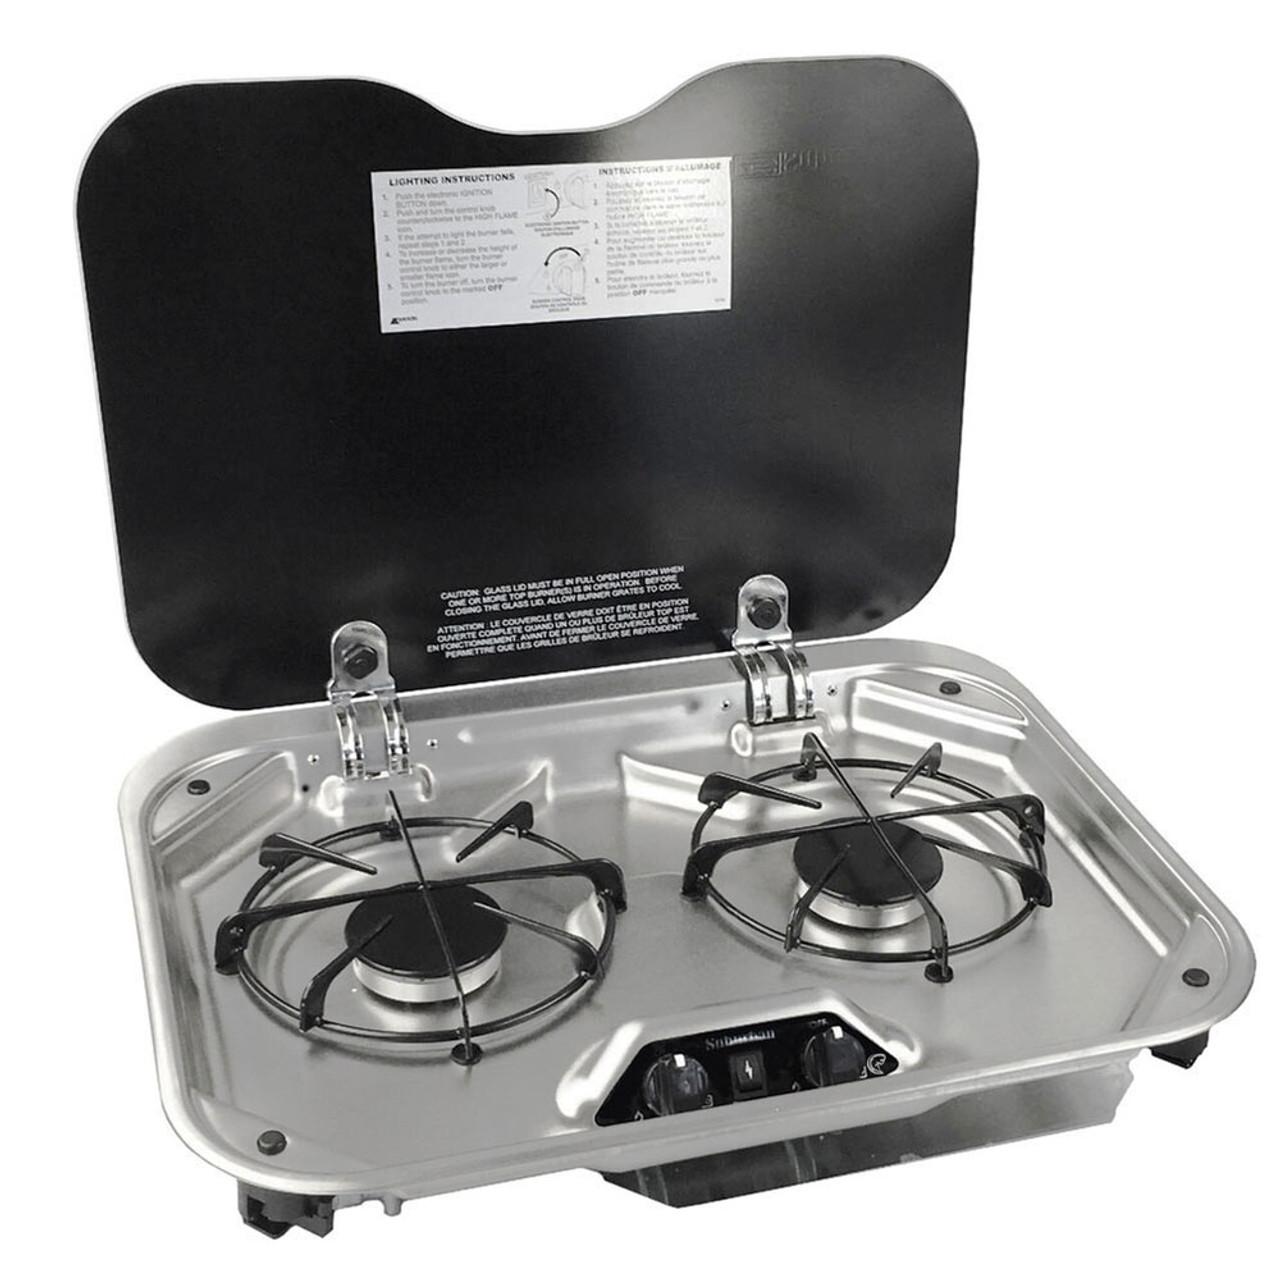 Rv Propane Stove >> Suburban 3031ast 2 Burner Rv Propane Cooktop W Glass Lid